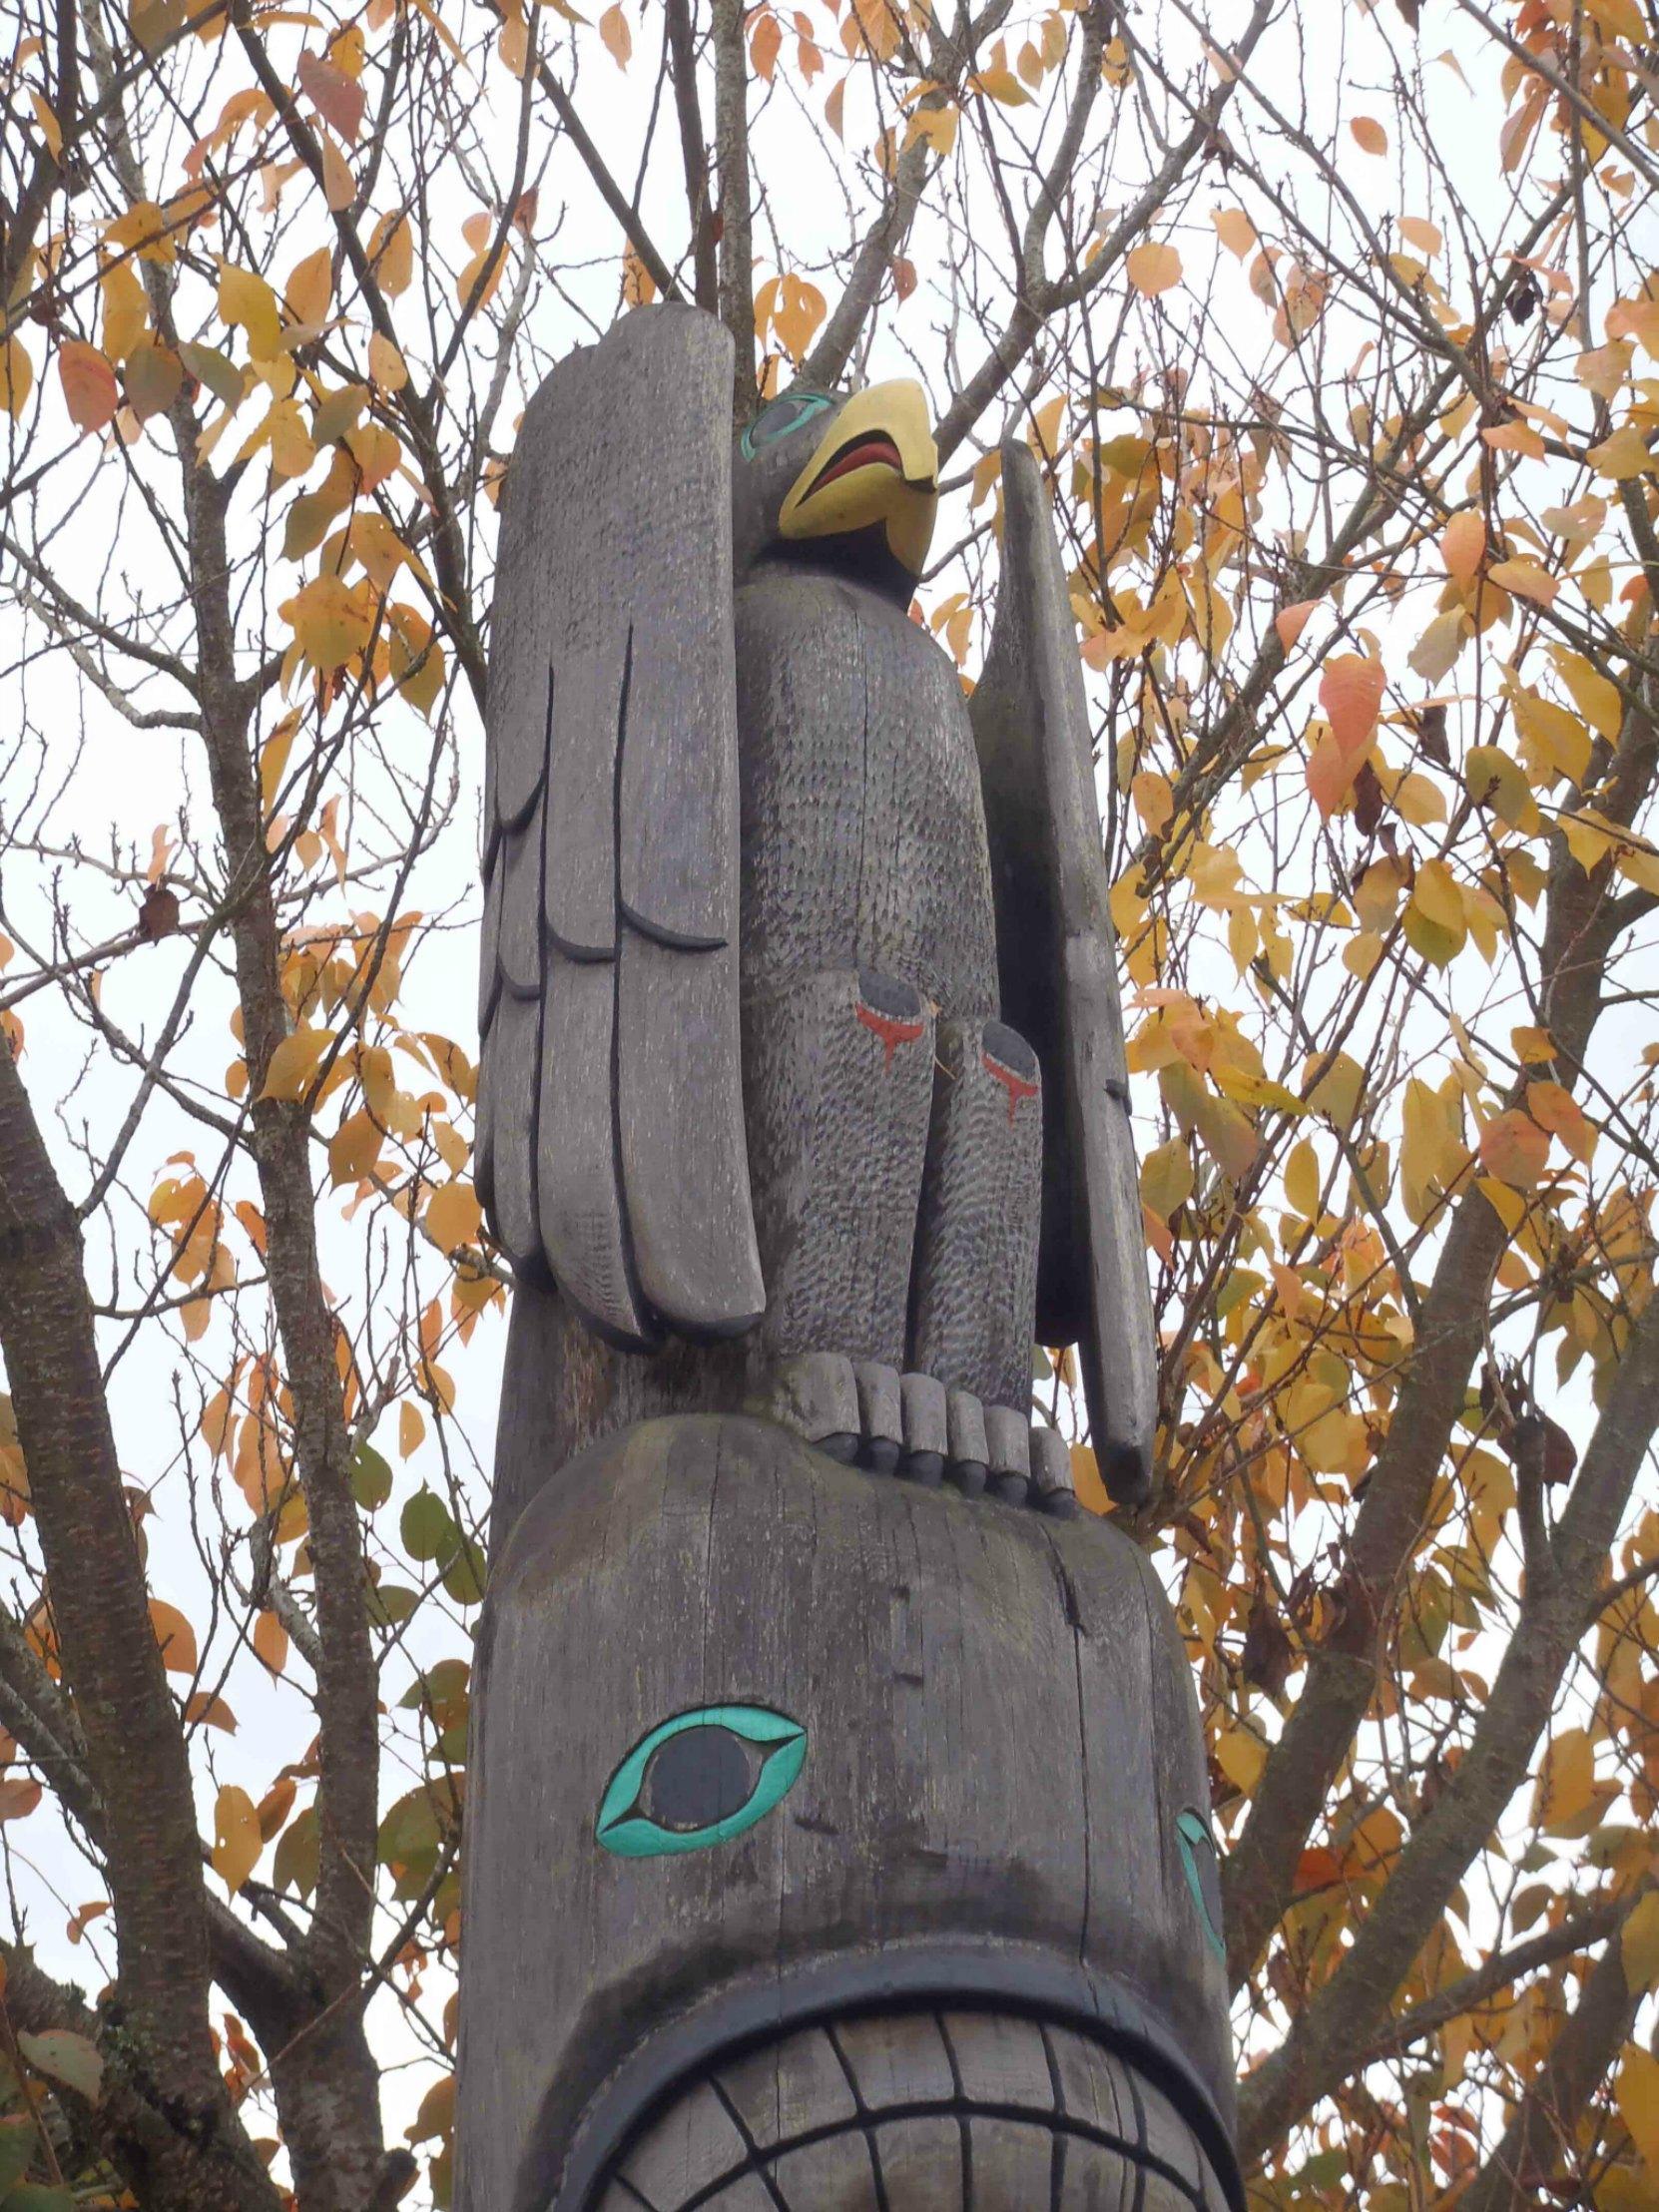 Tzinquaw Story totem pole, Thunderbird figure, Kenneth Street, Duncan, B.C.